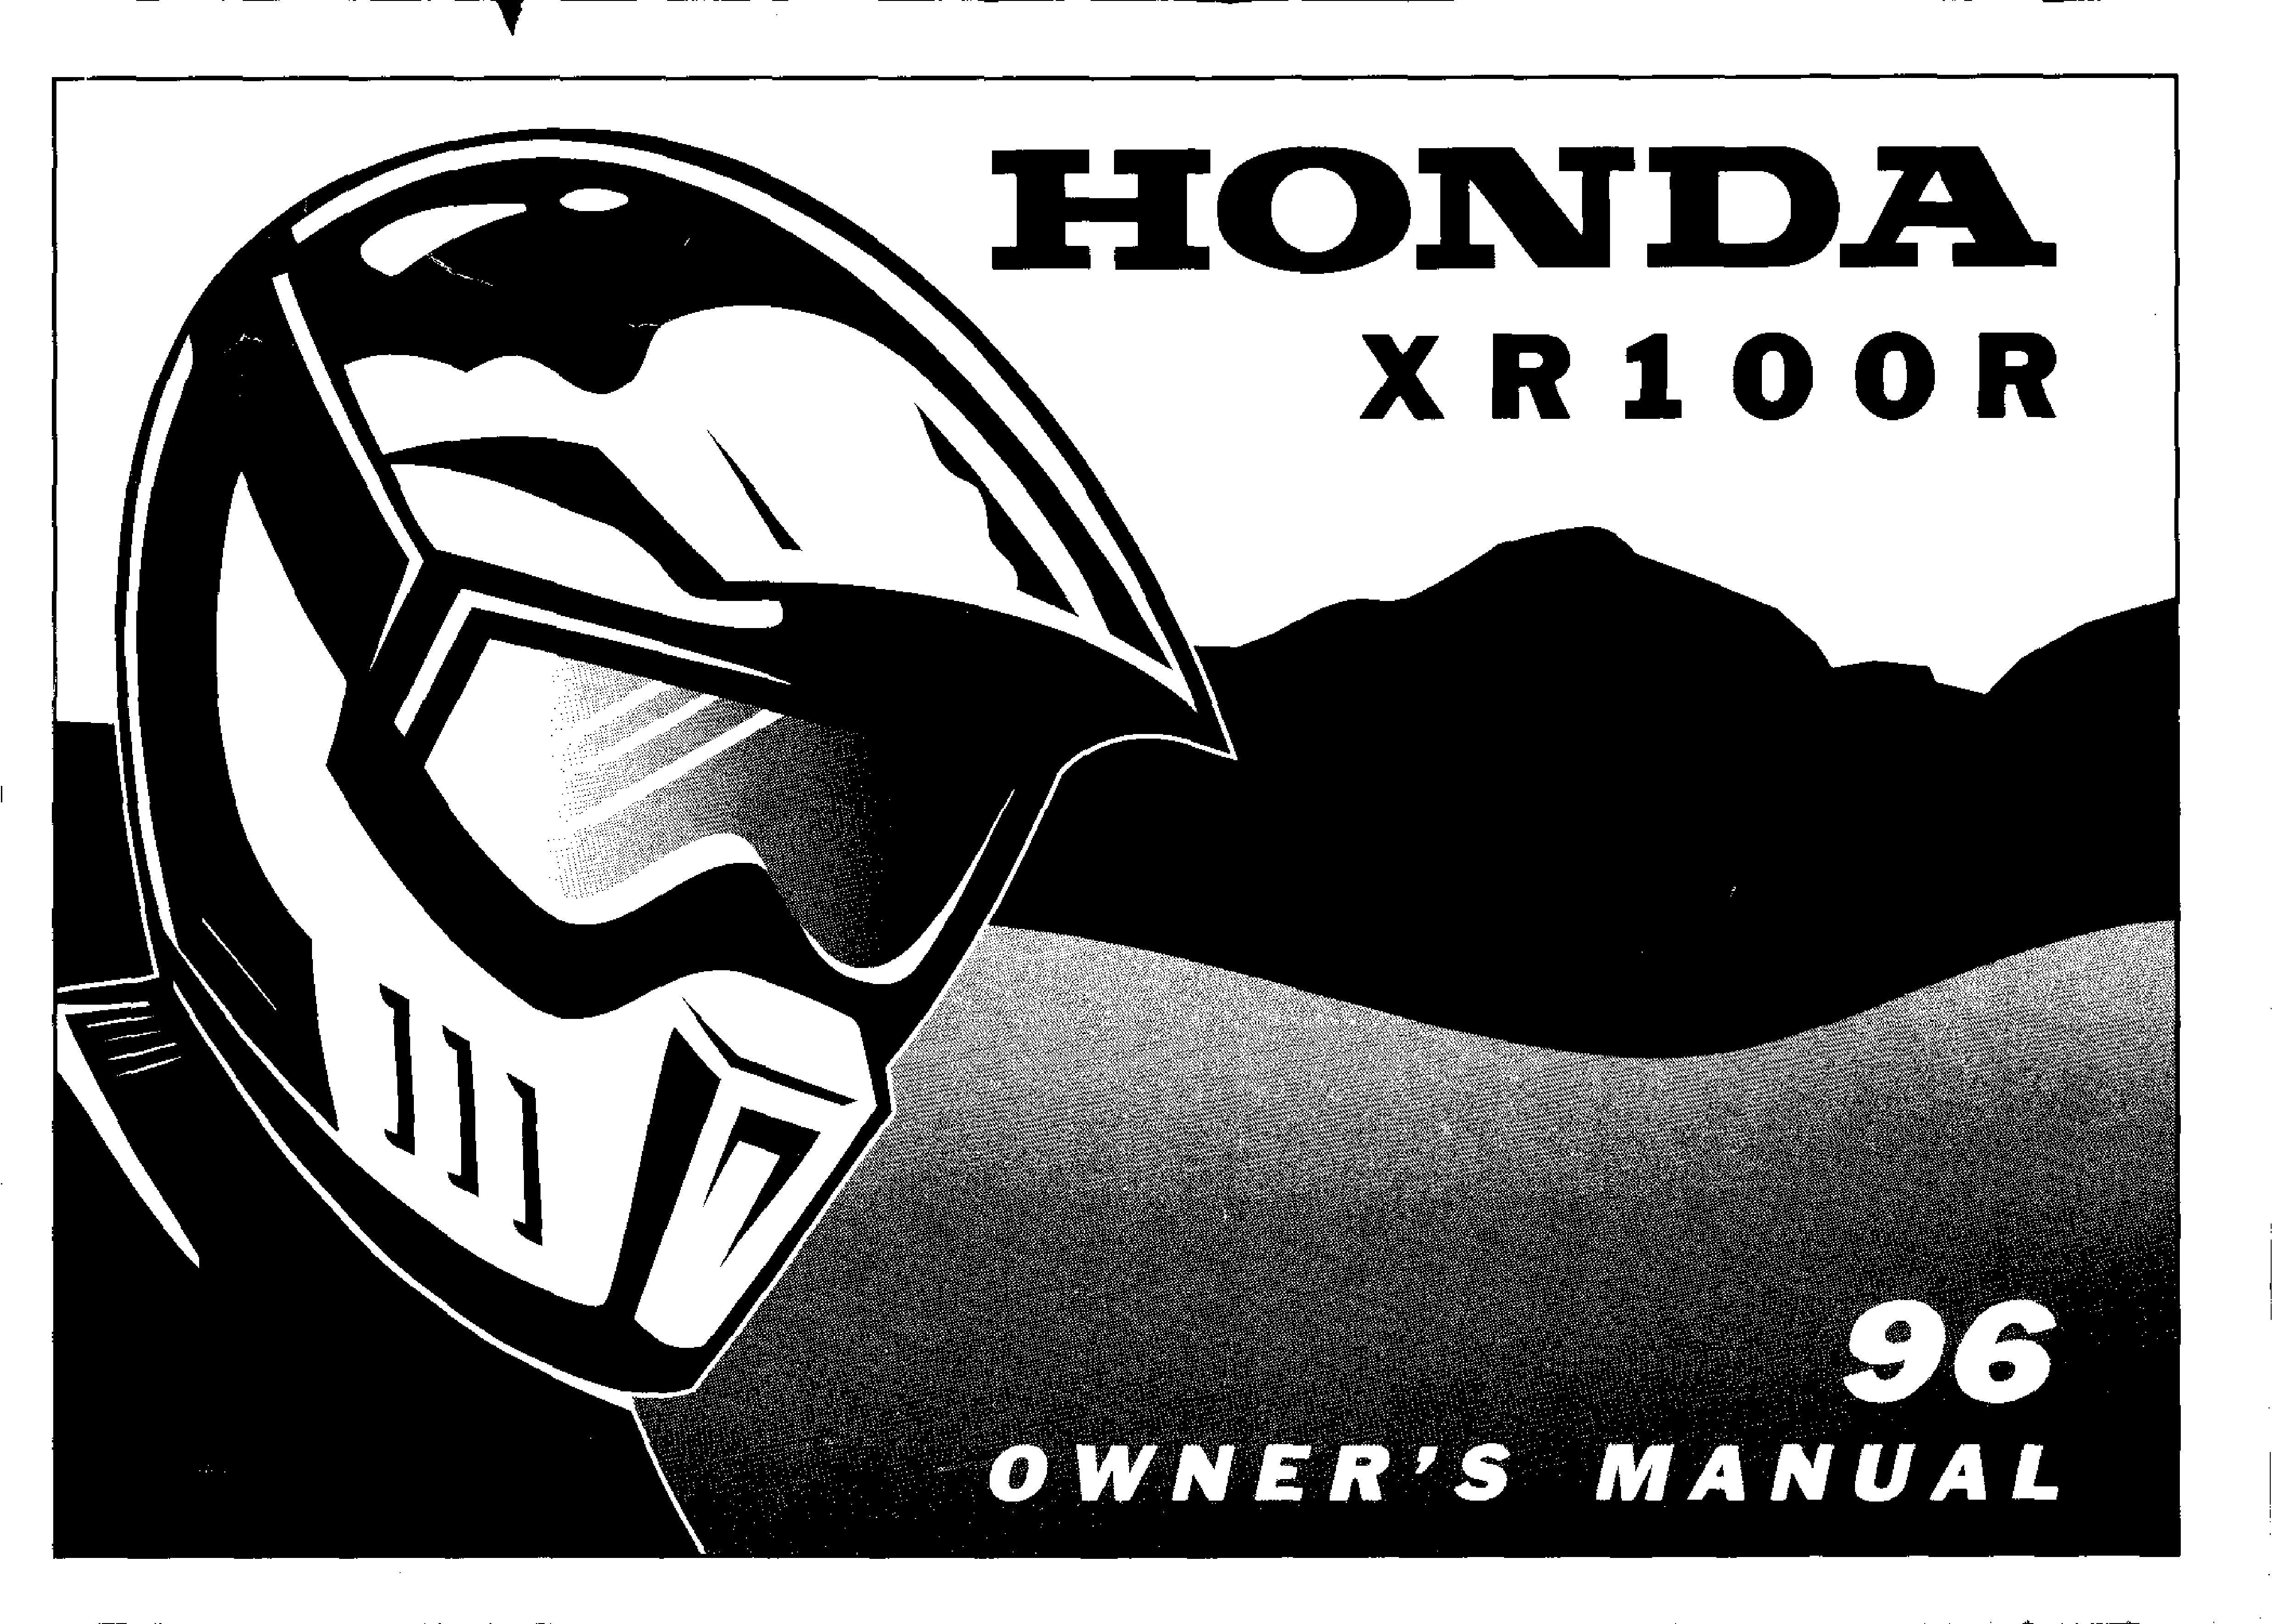 Owner's manual for Honda XR100R (1996)